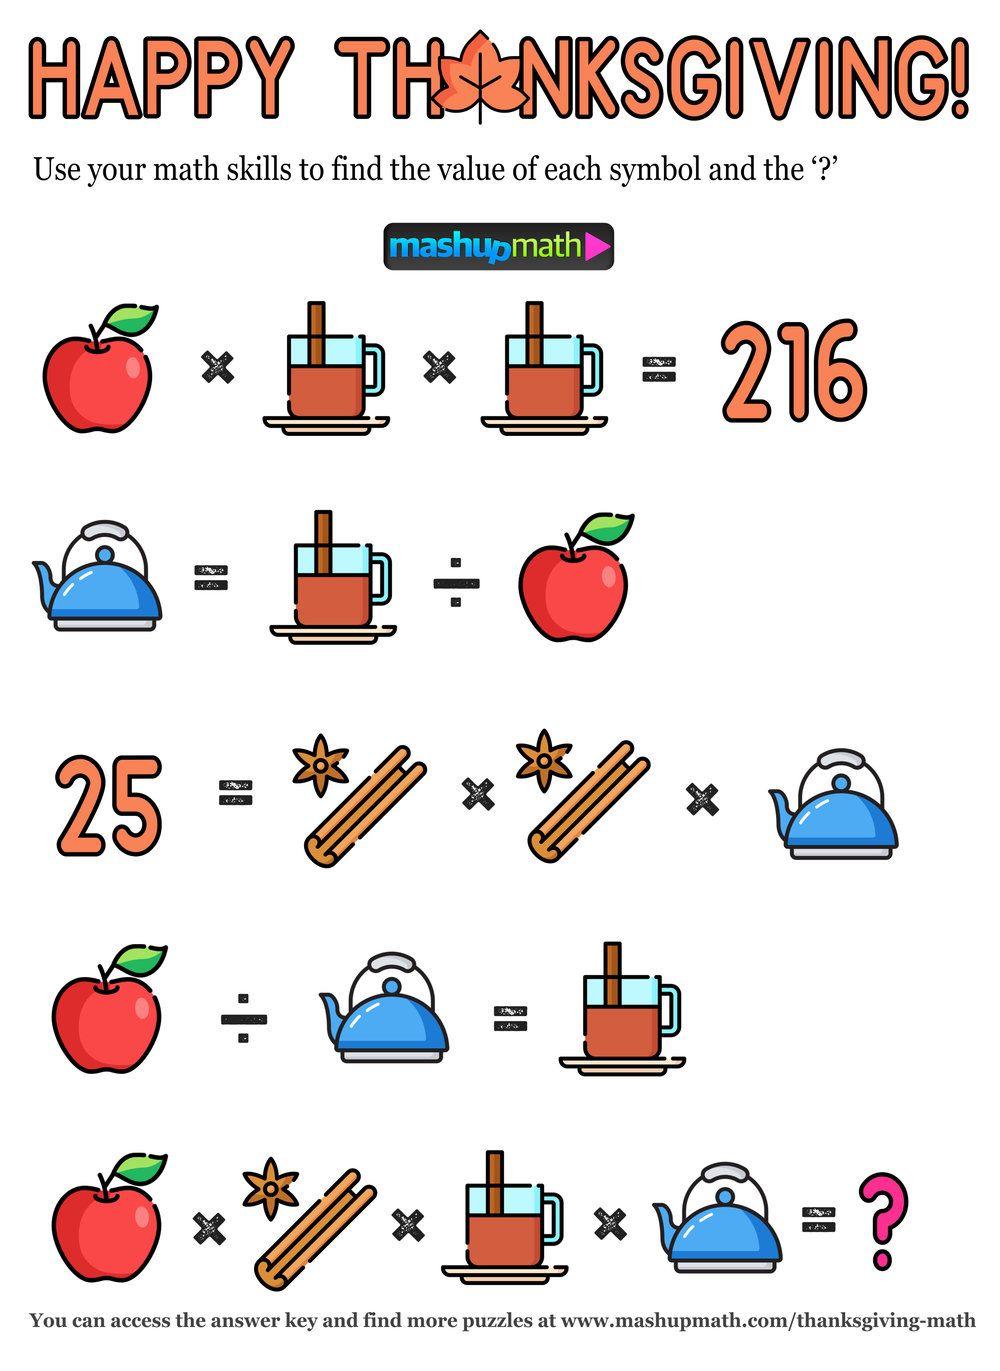 12 Thanksgiving Math Activities For Grades 1 8 Mashup Math Thanksgiving Math Thanksgiving Math Activities Math [ 1371 x 1000 Pixel ]